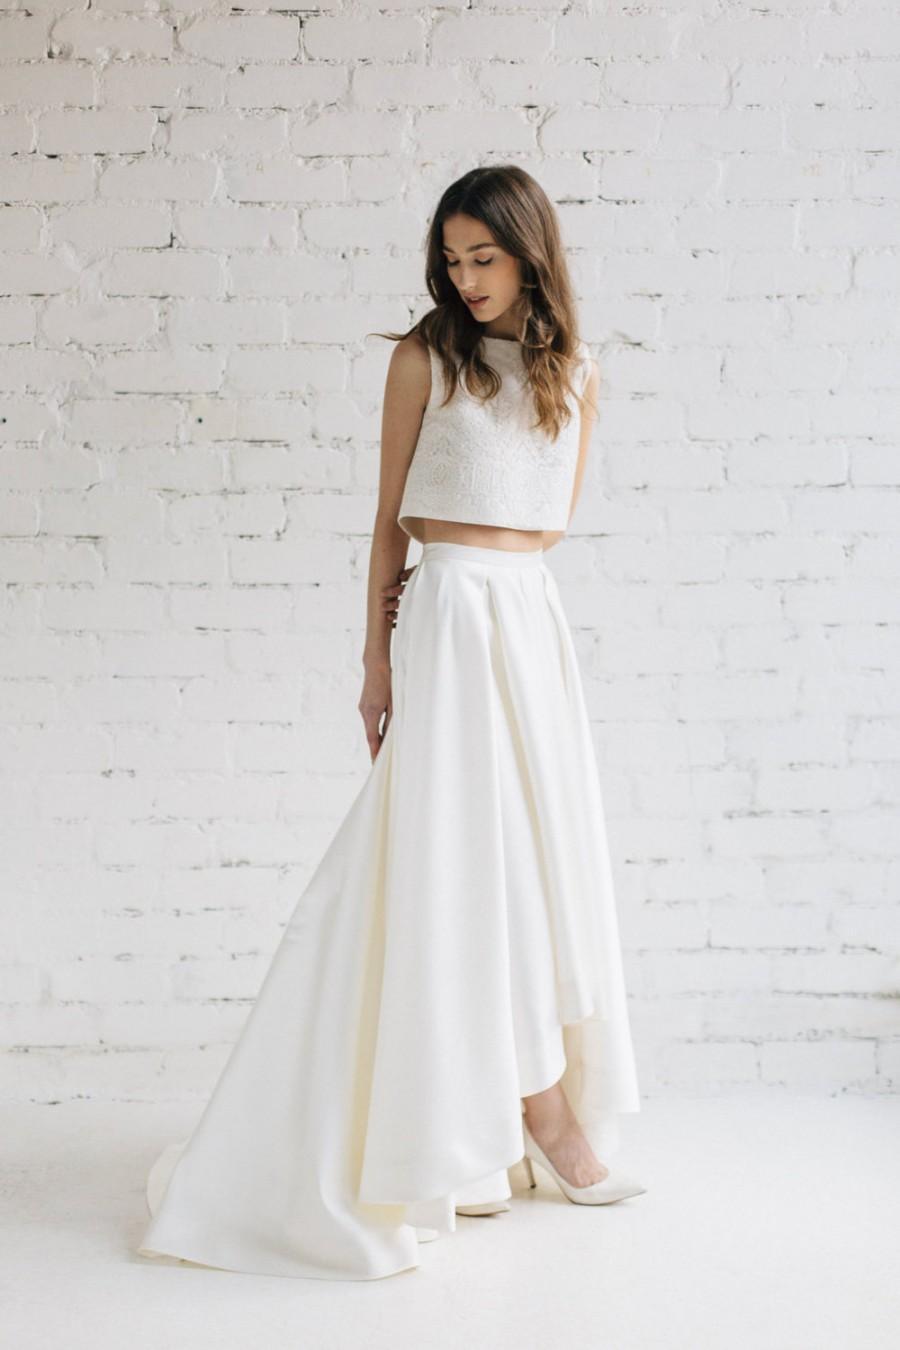 charlotte crop top skirt crop top wedding dress Black and white photo of two piece Monique Lhuillier wedding dress